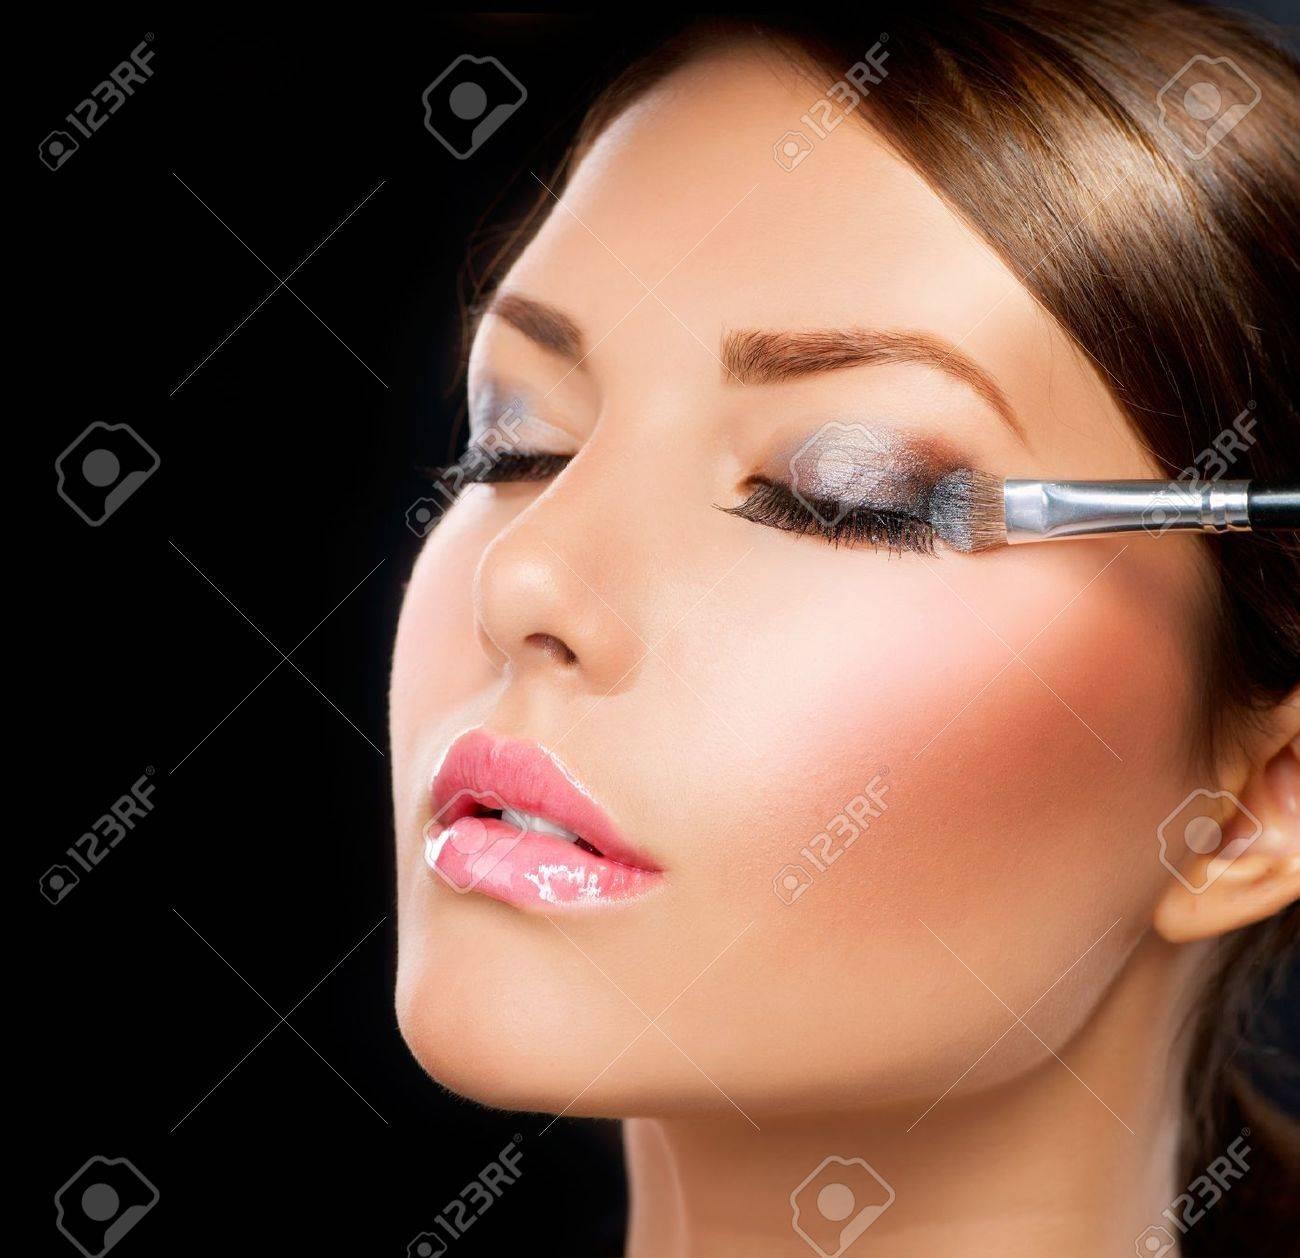 Make-up applying Eye shadow brush - 14622796